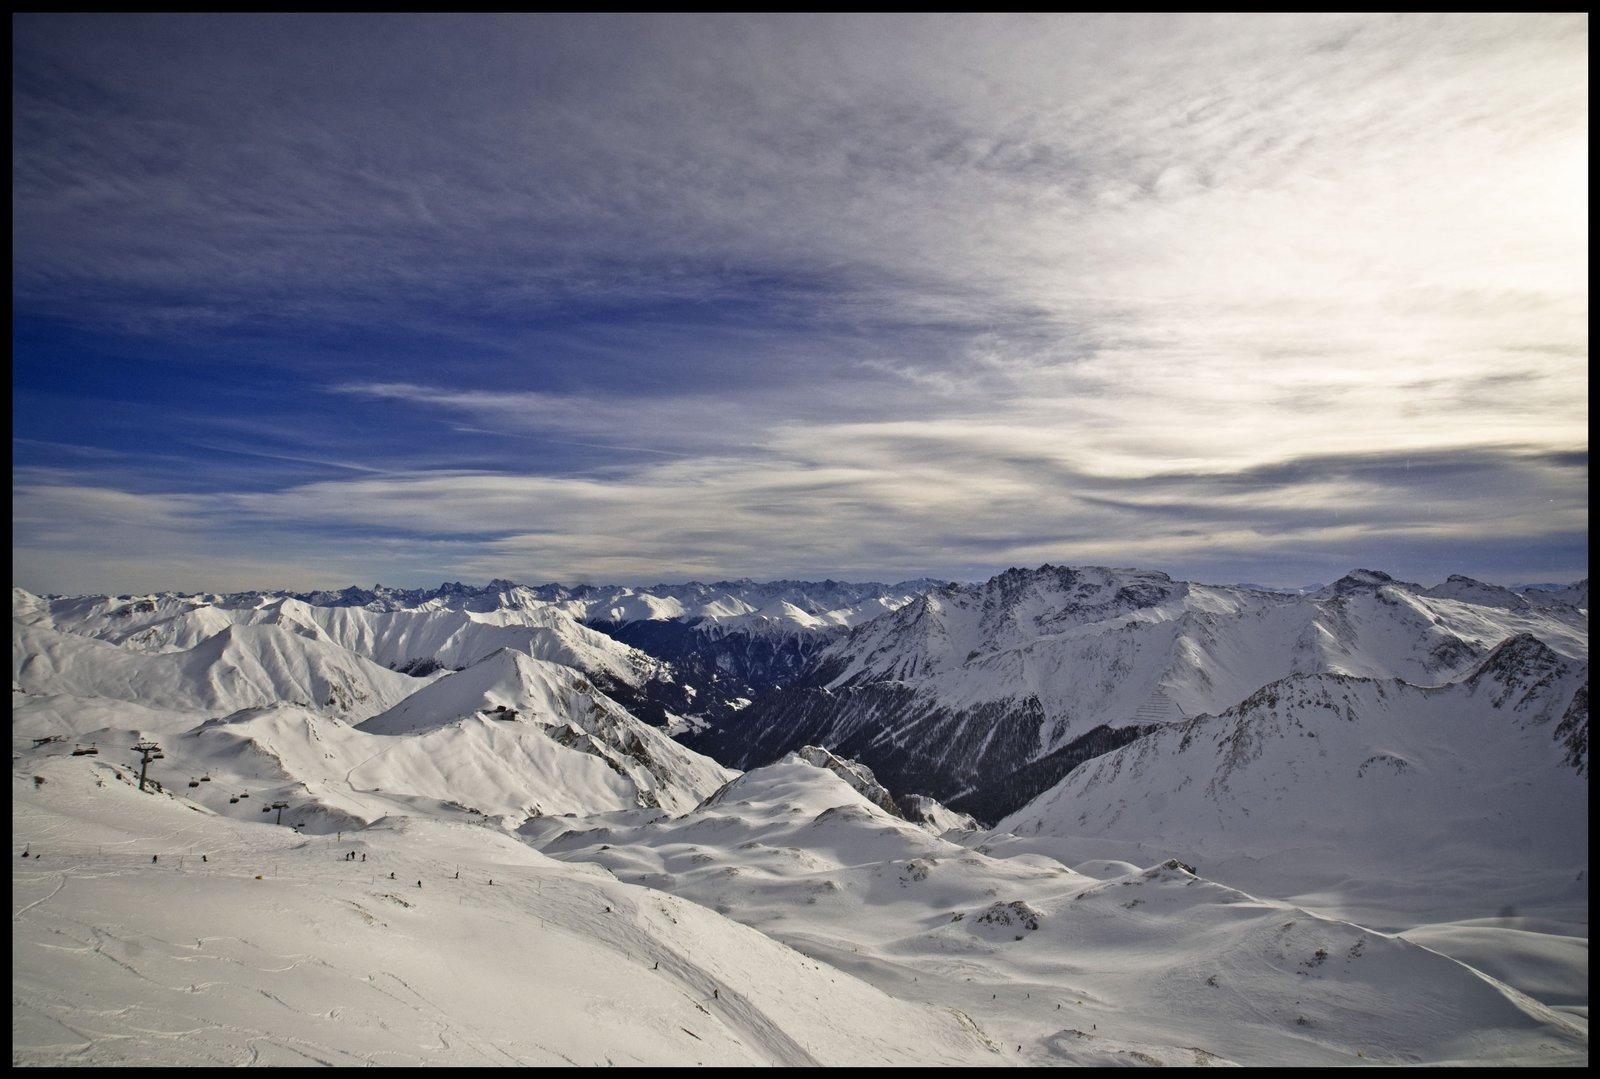 Our skiing aerea (samnaun/ischgl)